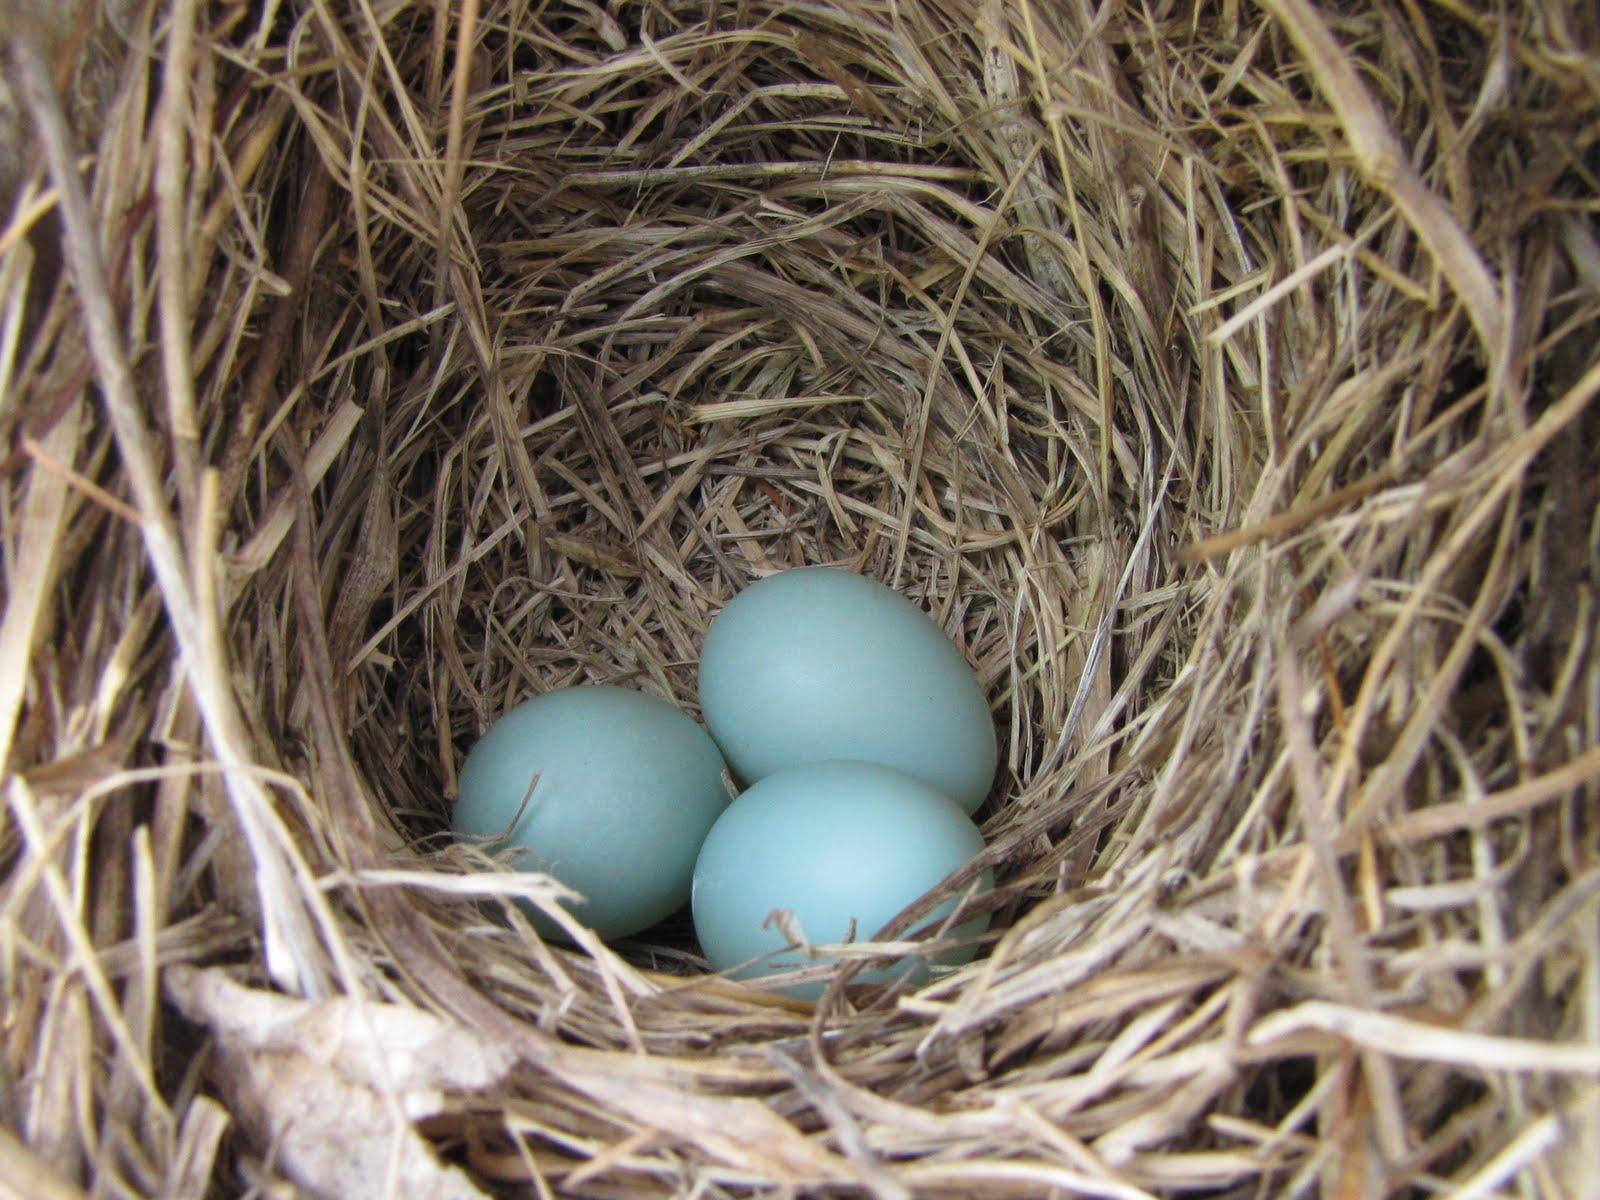 ... Box Plans likewise Bluebird Houses Nest Box Plans besides Baby Female